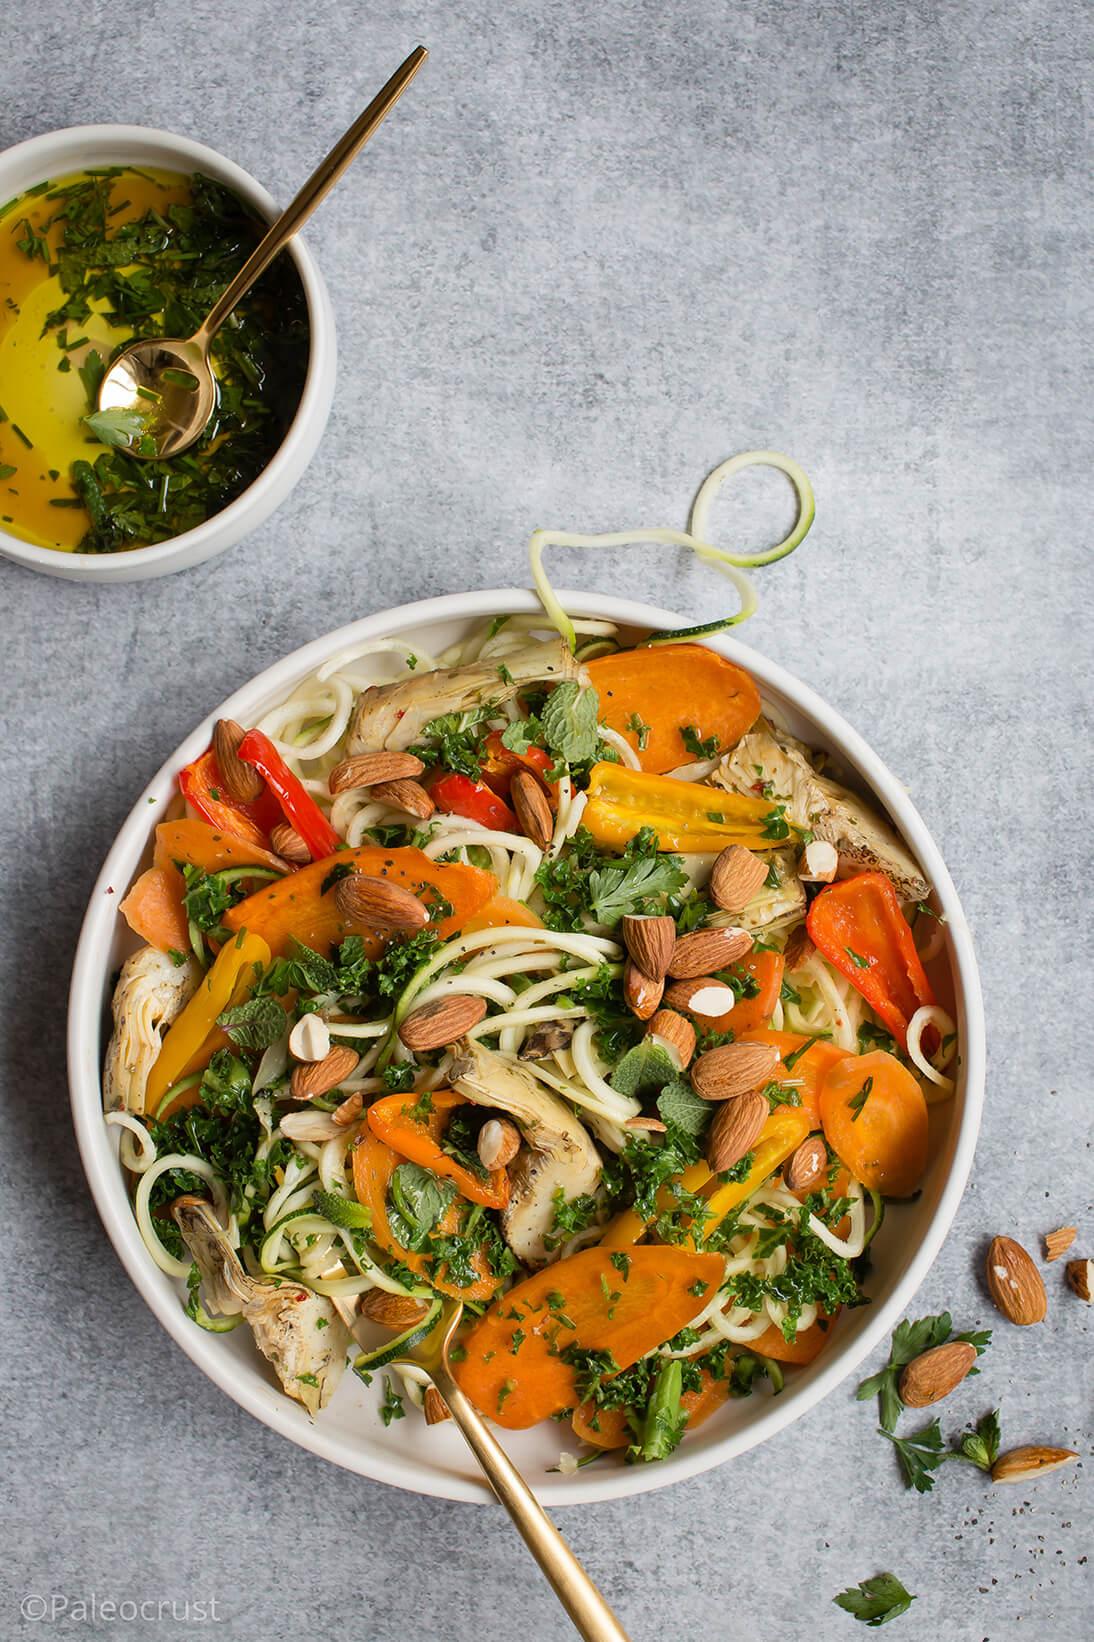 Courgette noodles, food styling, salad, healthy salad recipe, Keto recipes, Paleo recipes, Paleo, Paleo Crust, Vegan salad, vegetarian salad, food photography